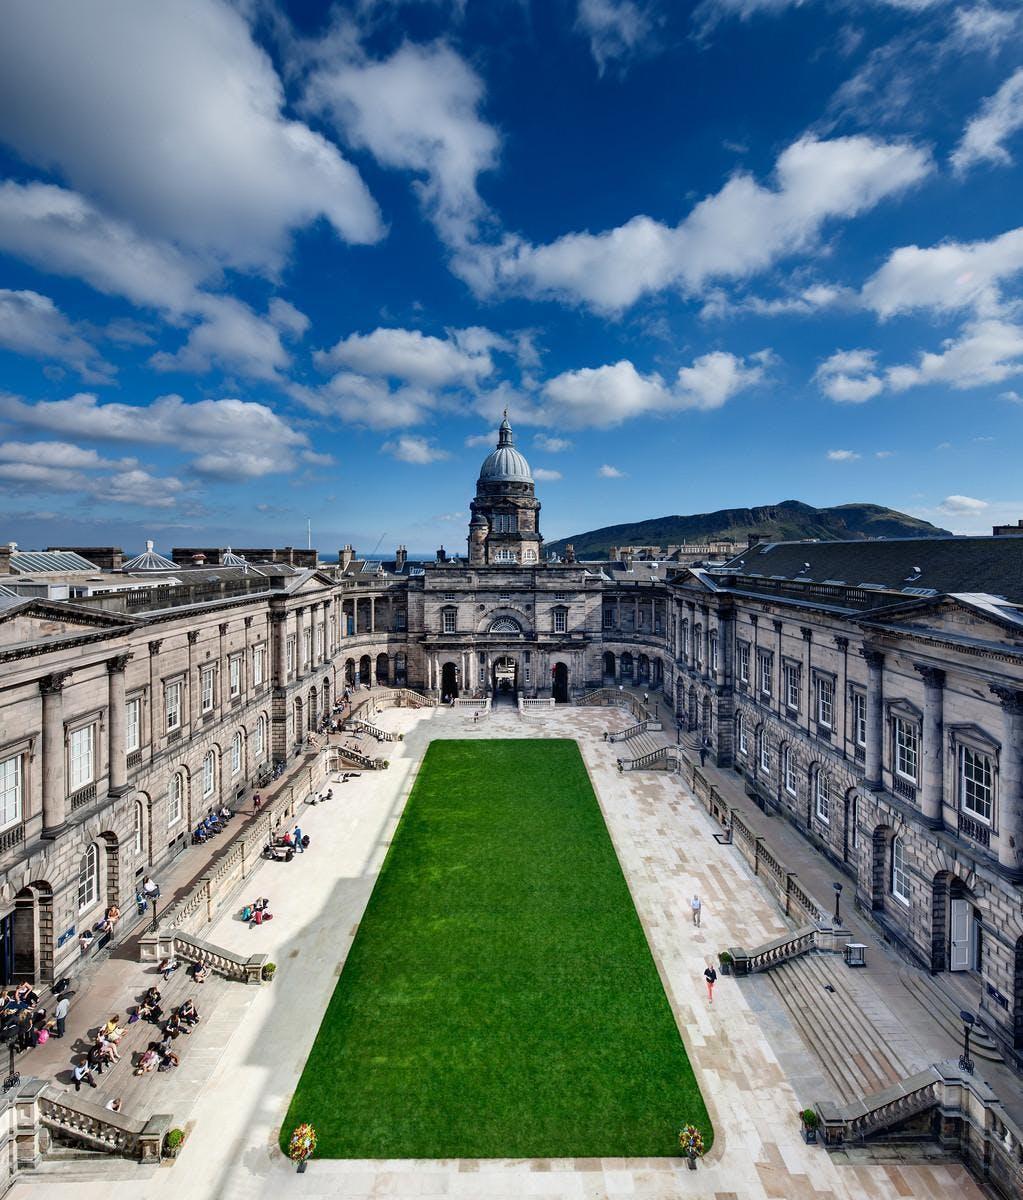 University of Edinburgh Boston Summer Gathering - 20 AUG 2018